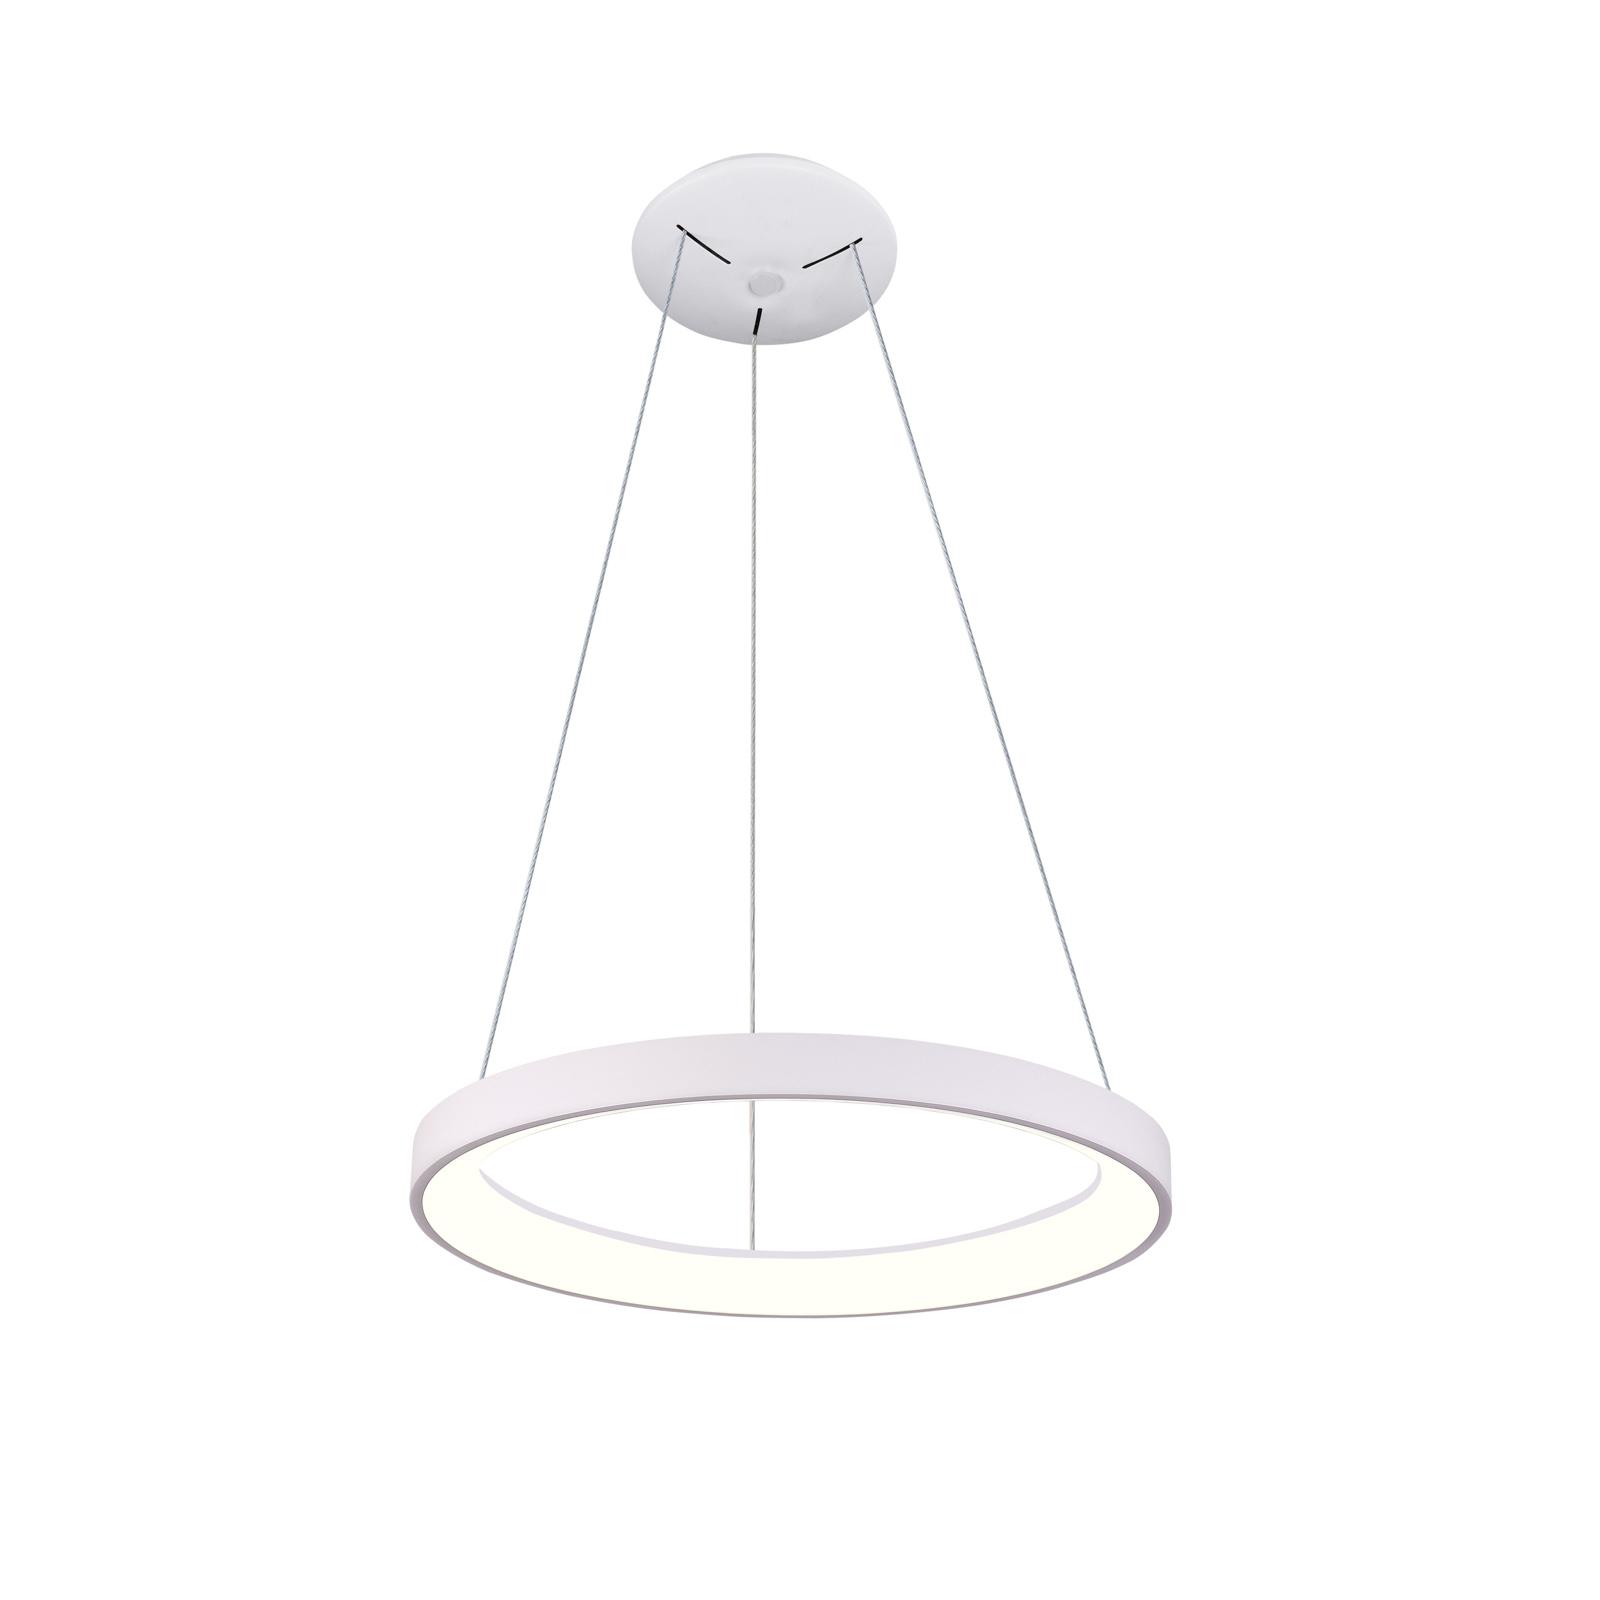 Arcchio Vivy LED-hengelampe, hvit, 38 cm